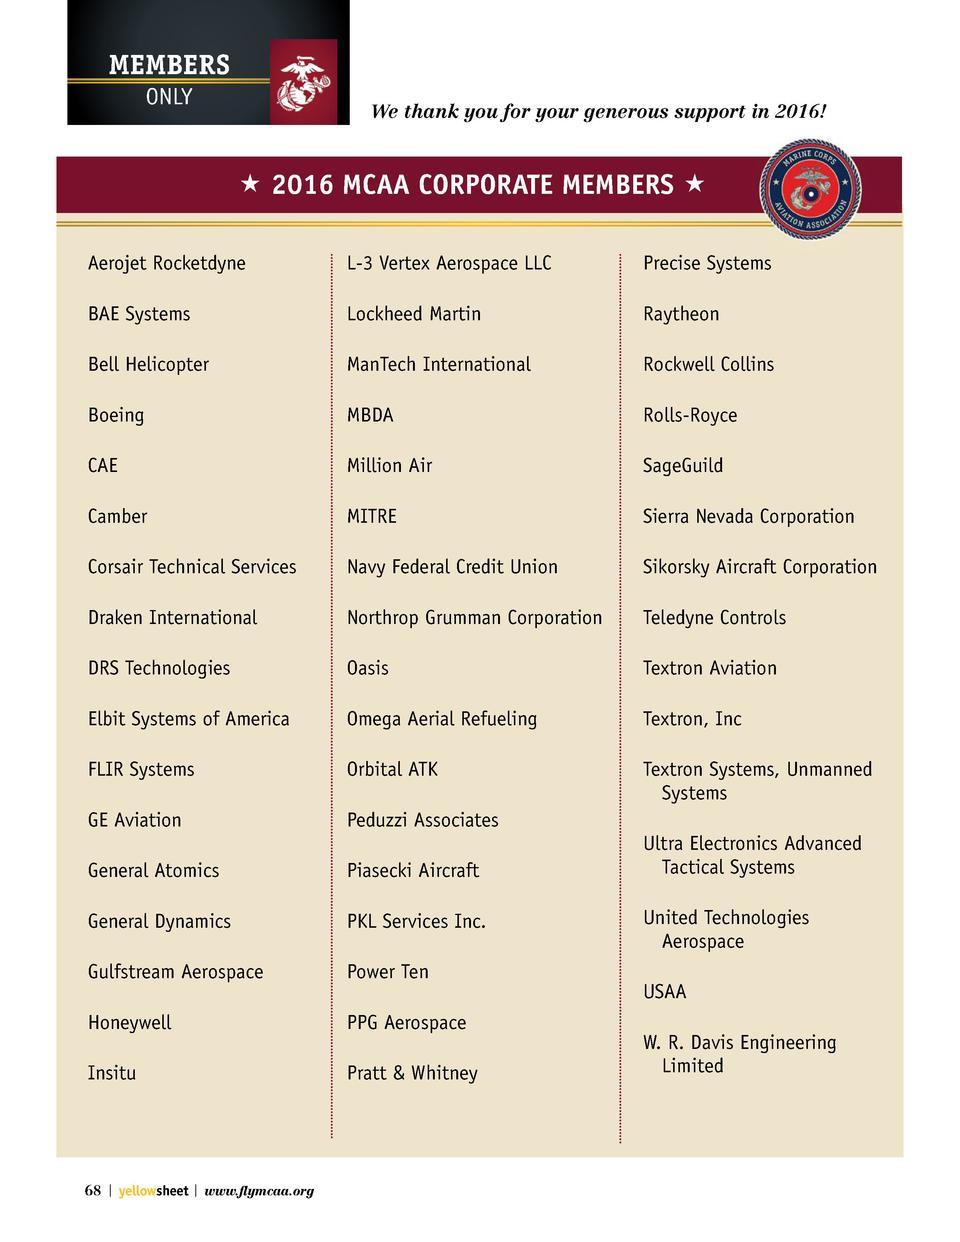 Northrop Grumman Federal Credit Union >> Yellow Sheet Fall 2016 : simplebooklet.com